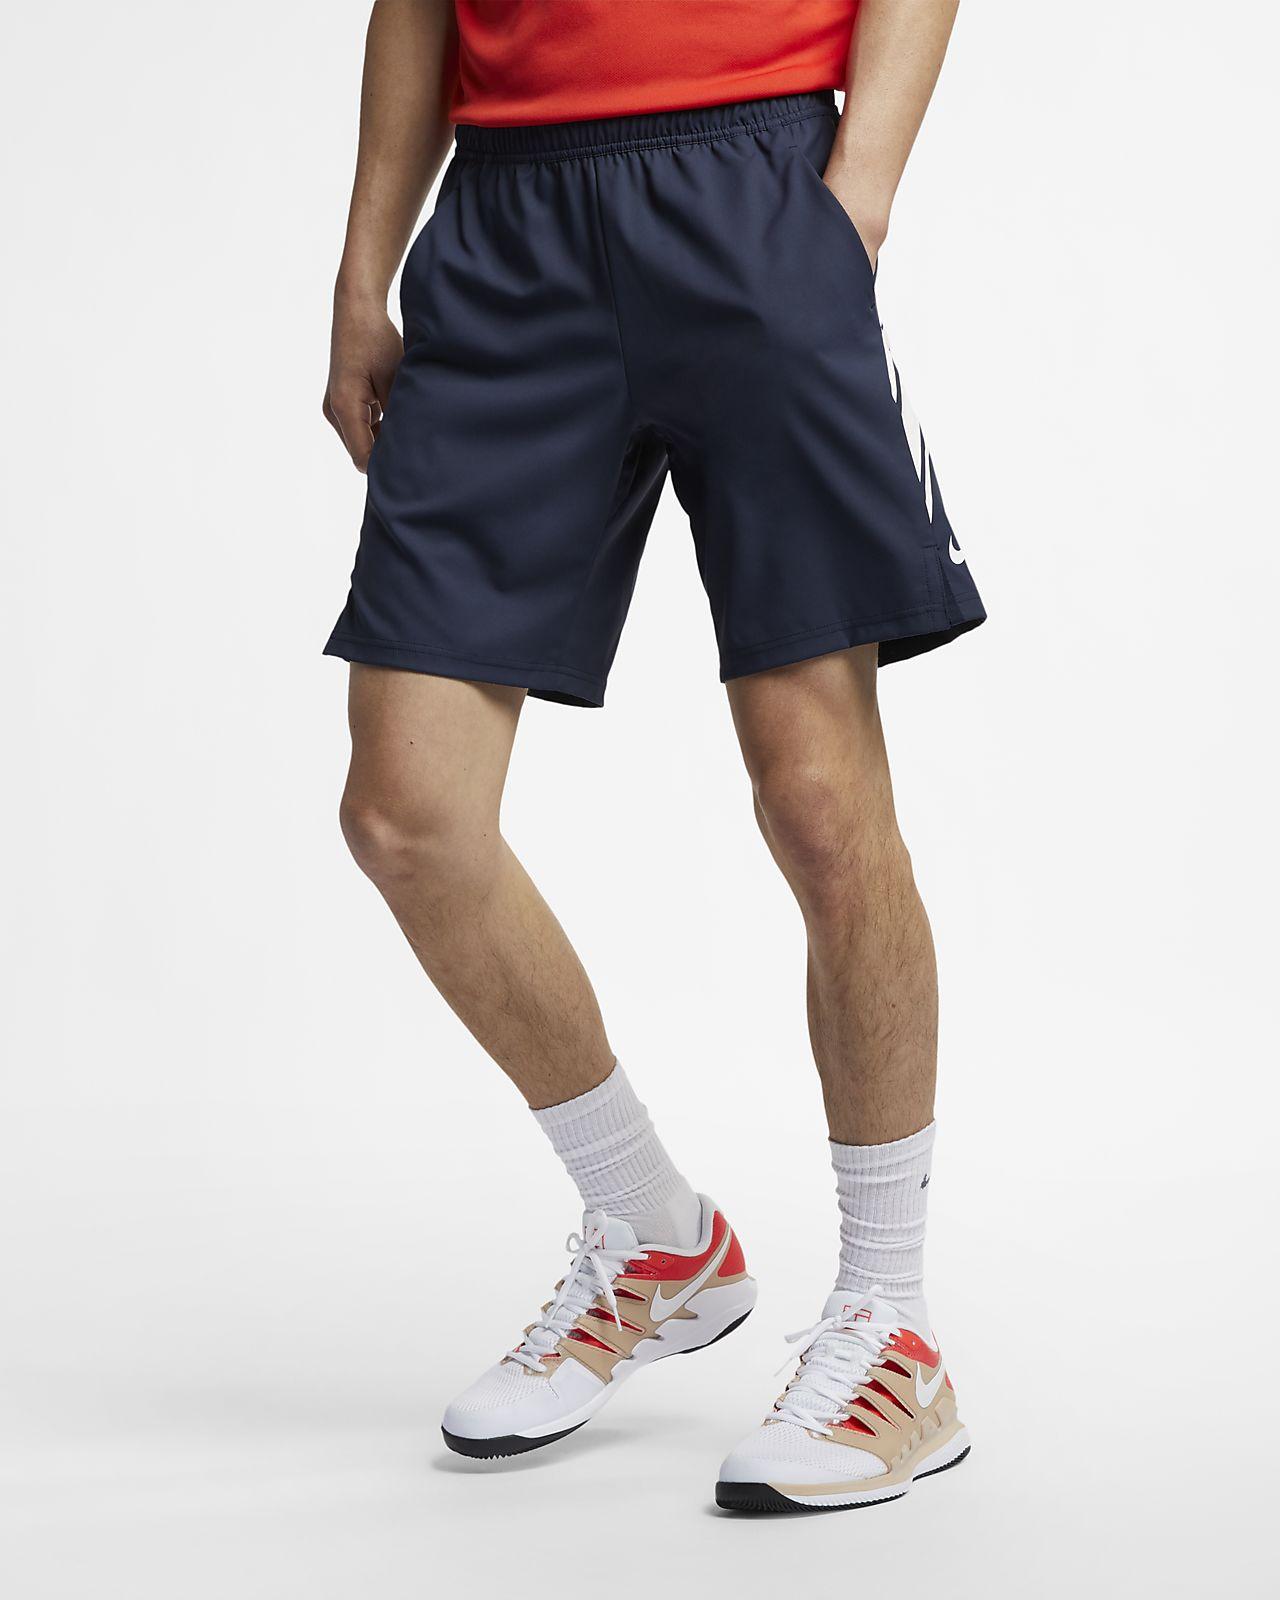 Shorts da tennis 23 cm NikeCourt Dri-FIT - Uomo